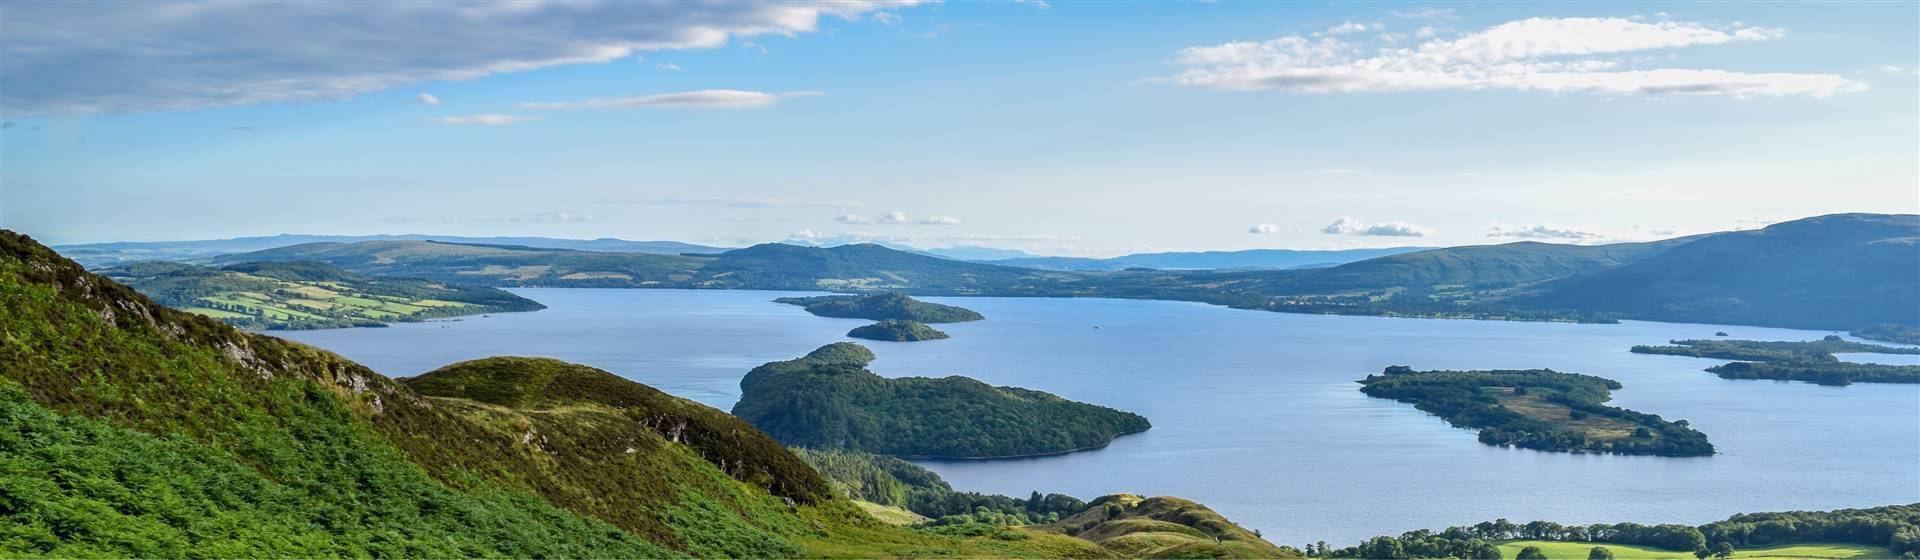 Loch Lomond, Trossachs & Edinburgh